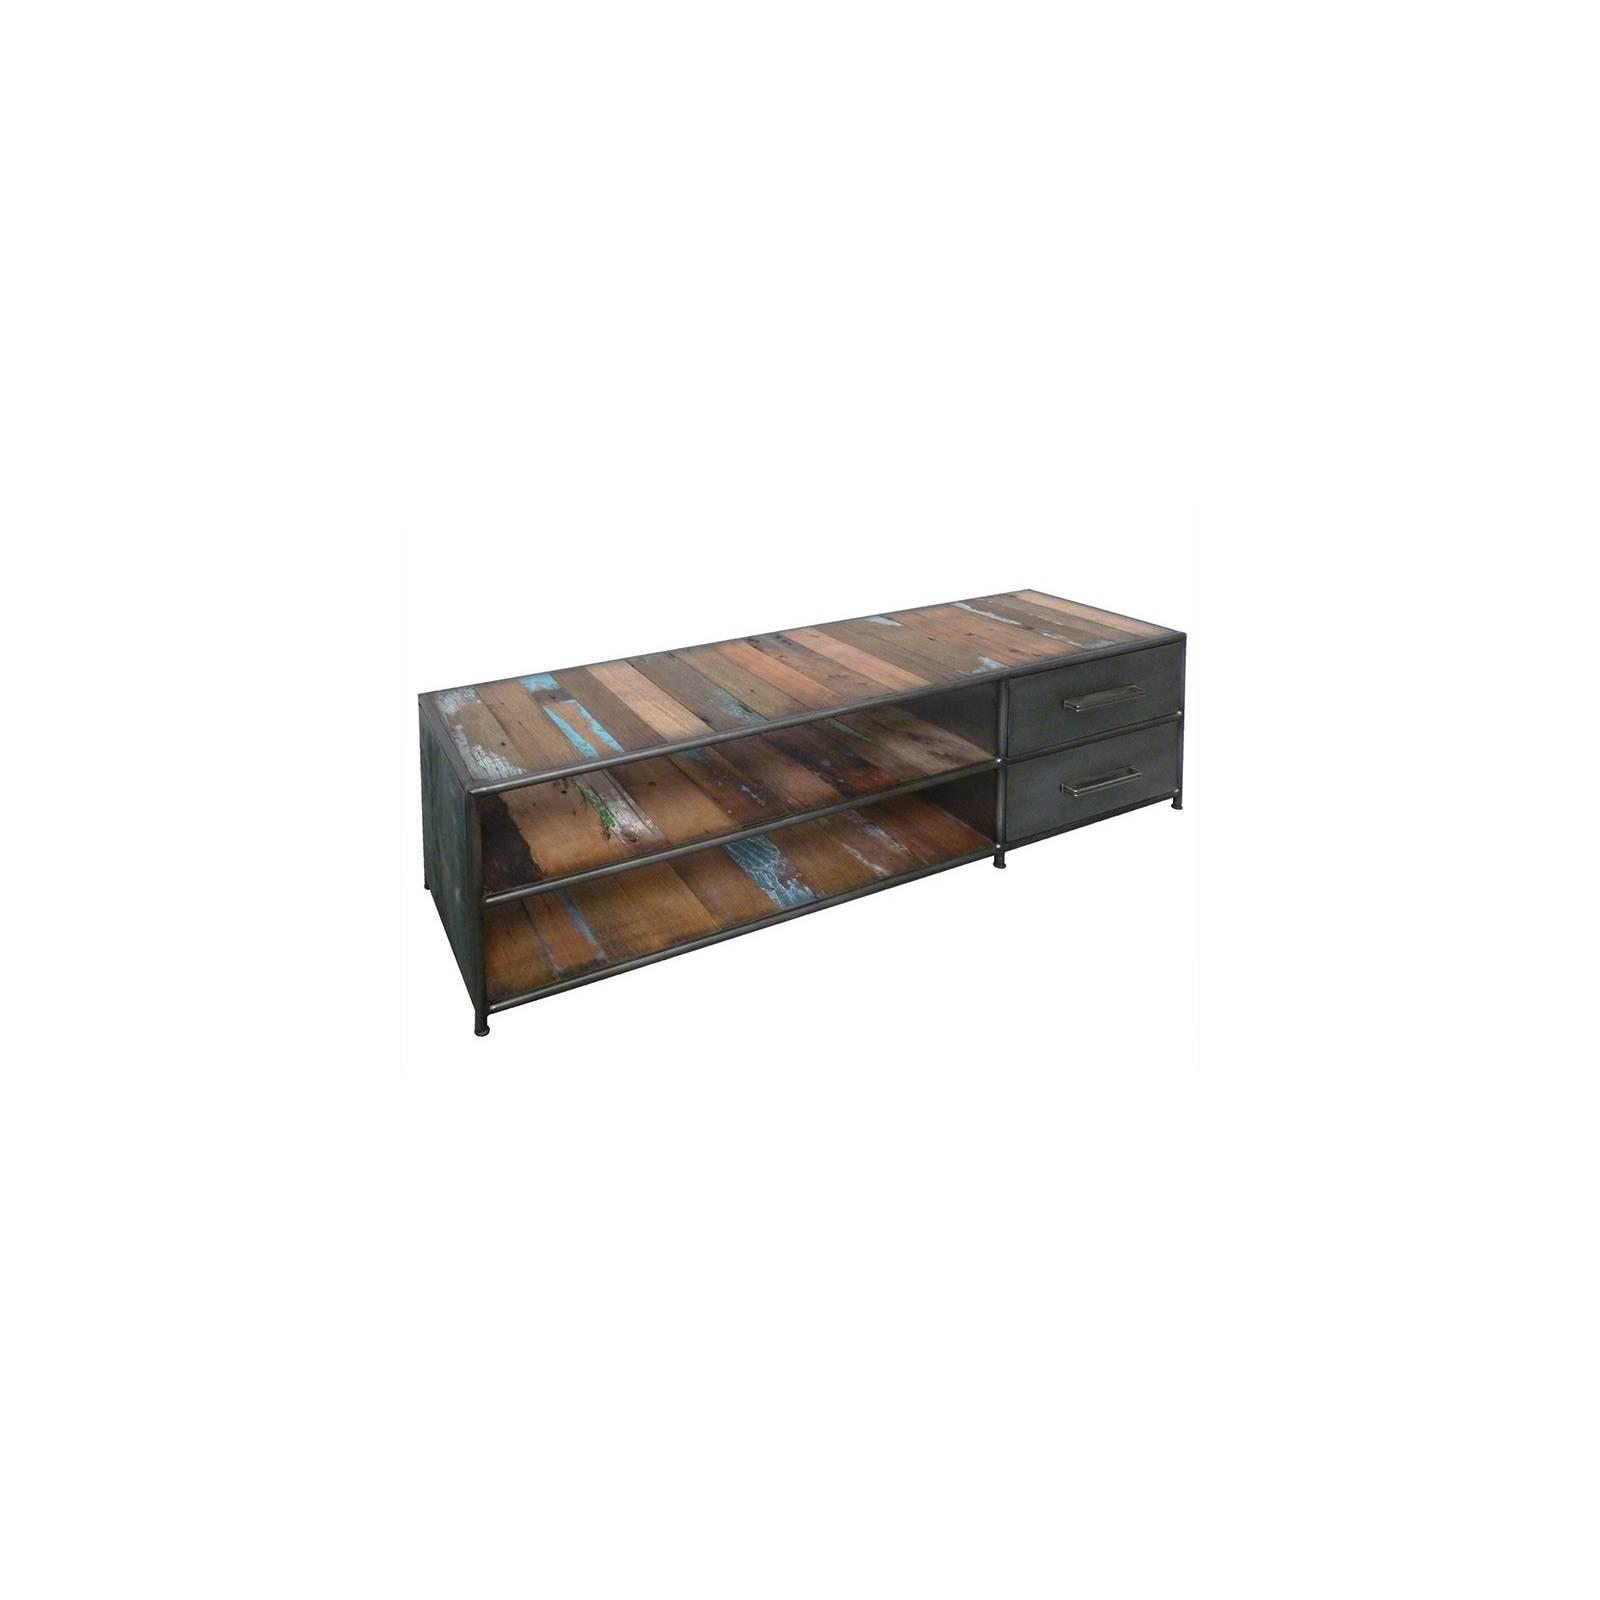 Meuble Tv Luxor Teck - meuble bois massif